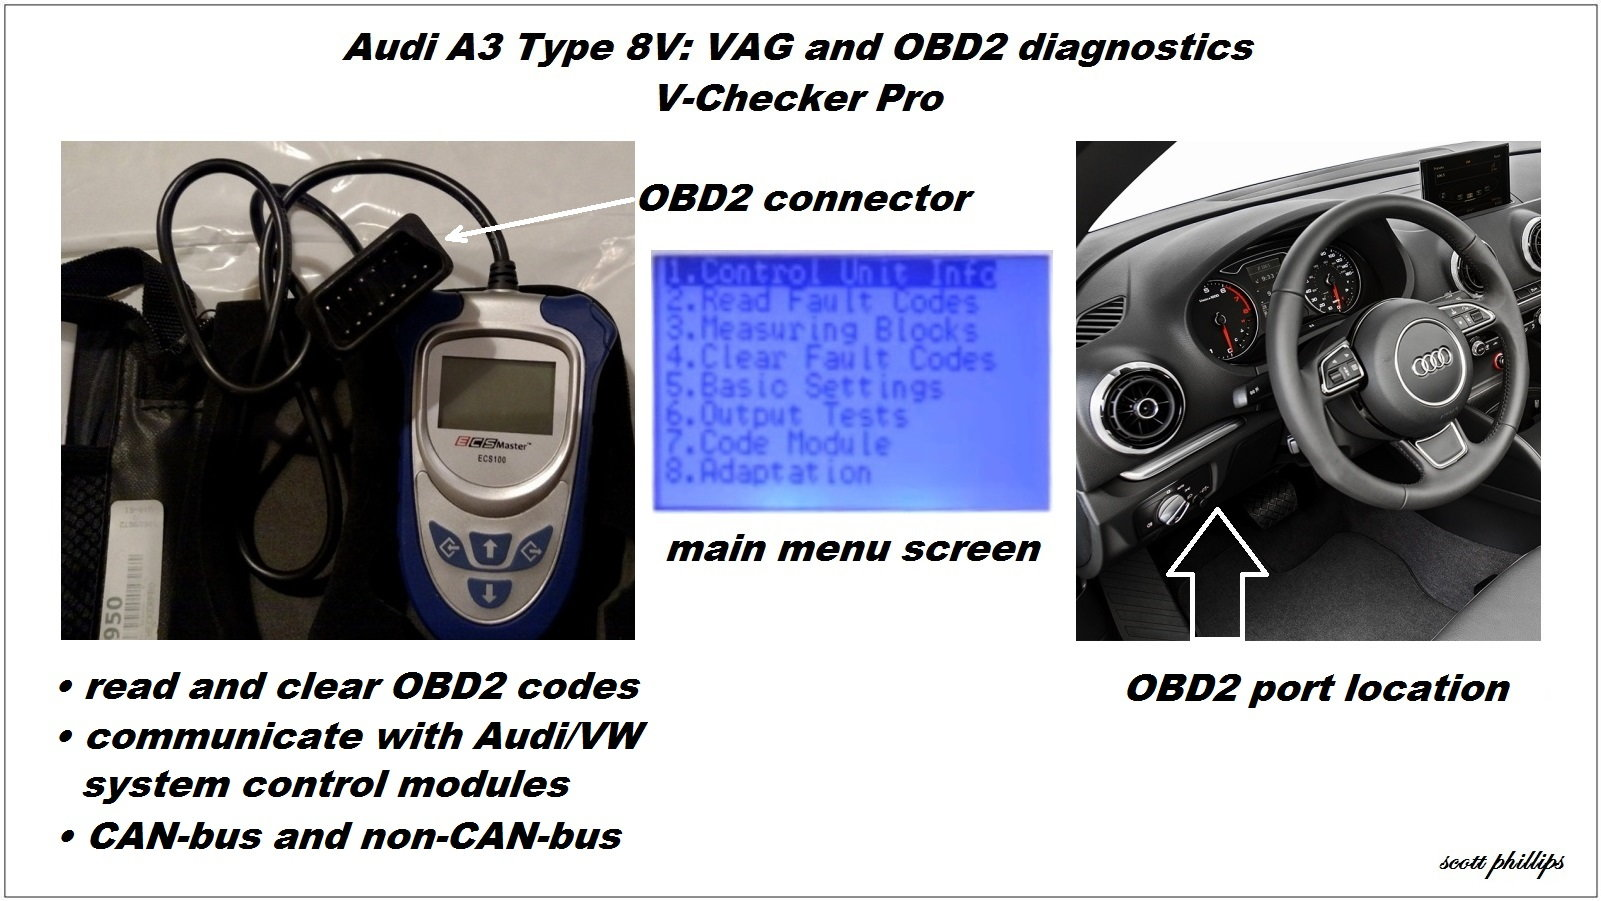 ignition switch and obd live data 1988 36v club car wiring diagram audi a3 tips tricks audiworld